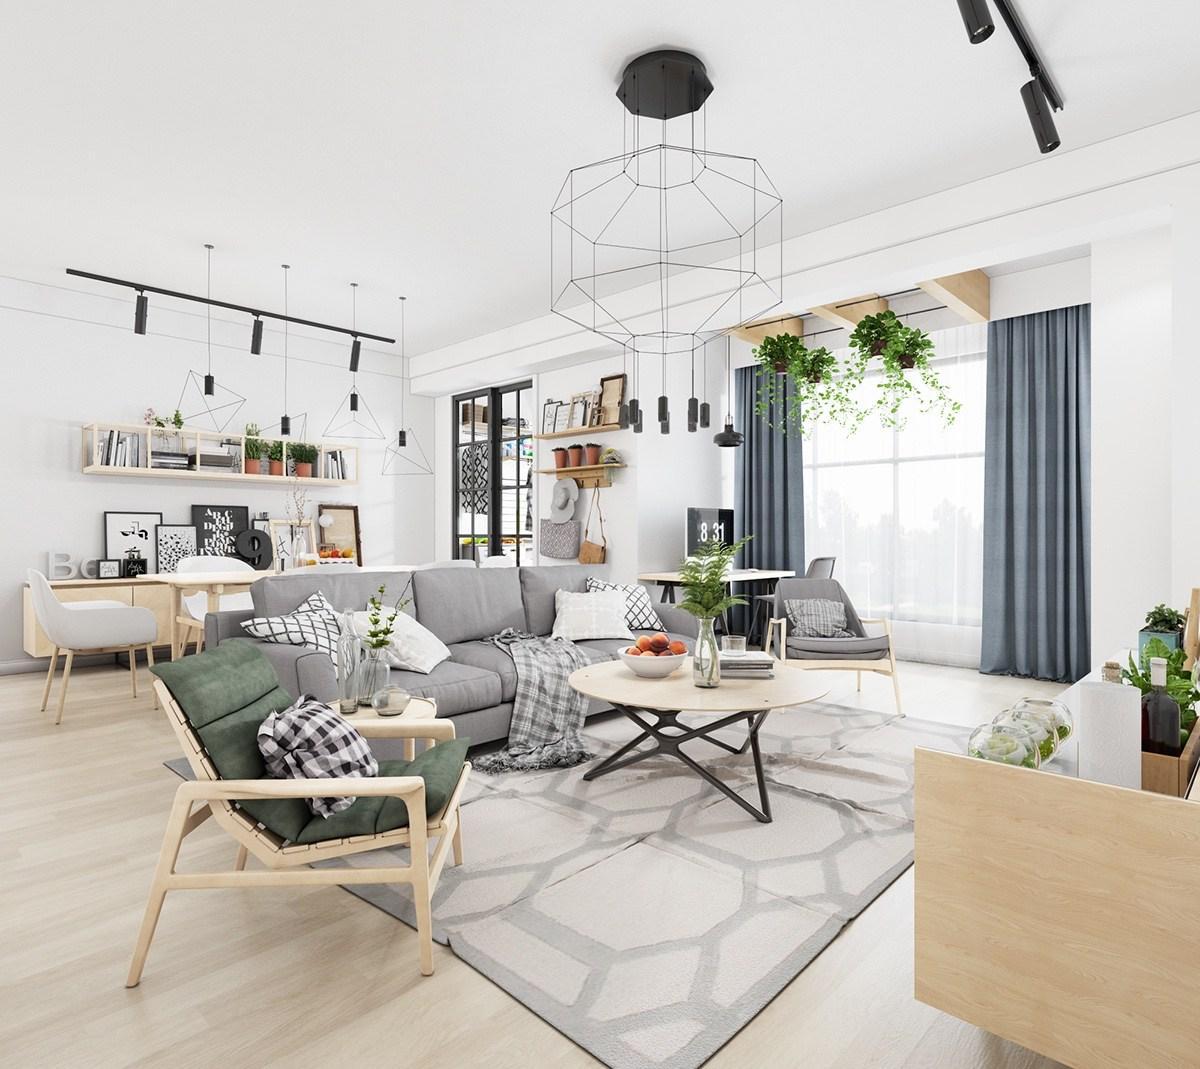 Las plantas aportarán vida a tu casa Nórdica